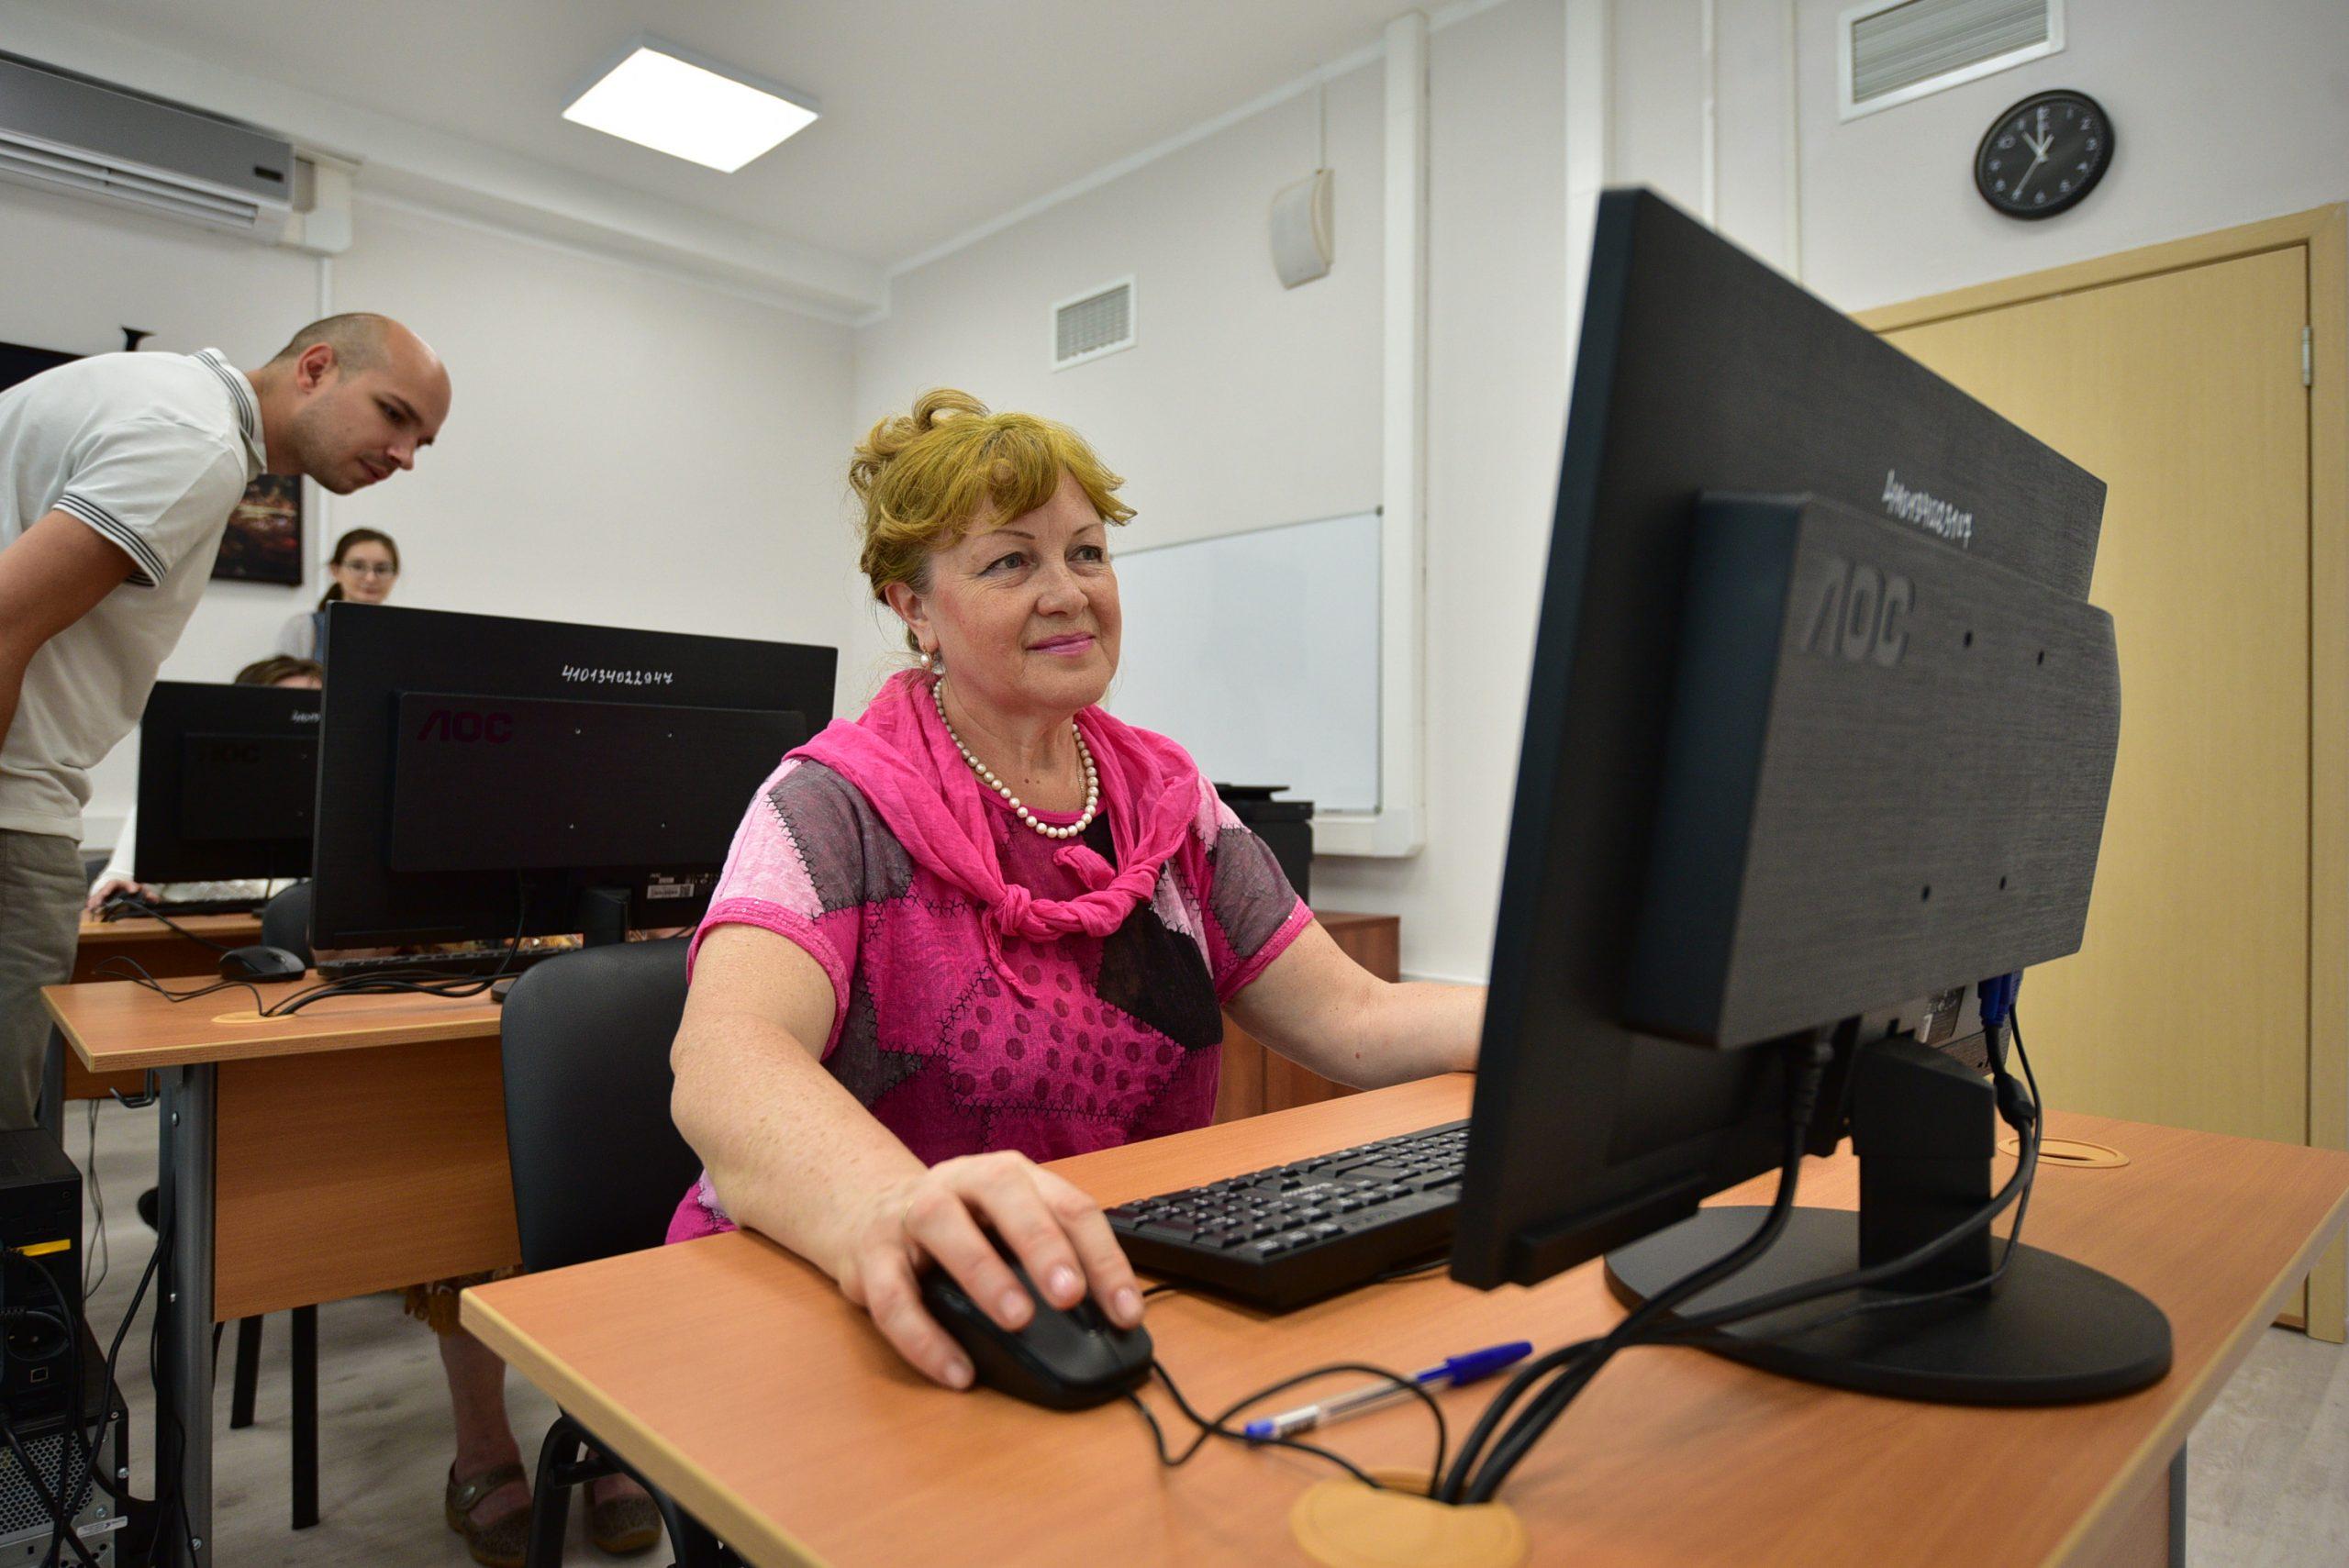 Онлайн-марафон красоты проведут сотрудники Центра соцобслуживания «Орехово». Фото: Пелагия Замятина, «Вечерняя Москва»